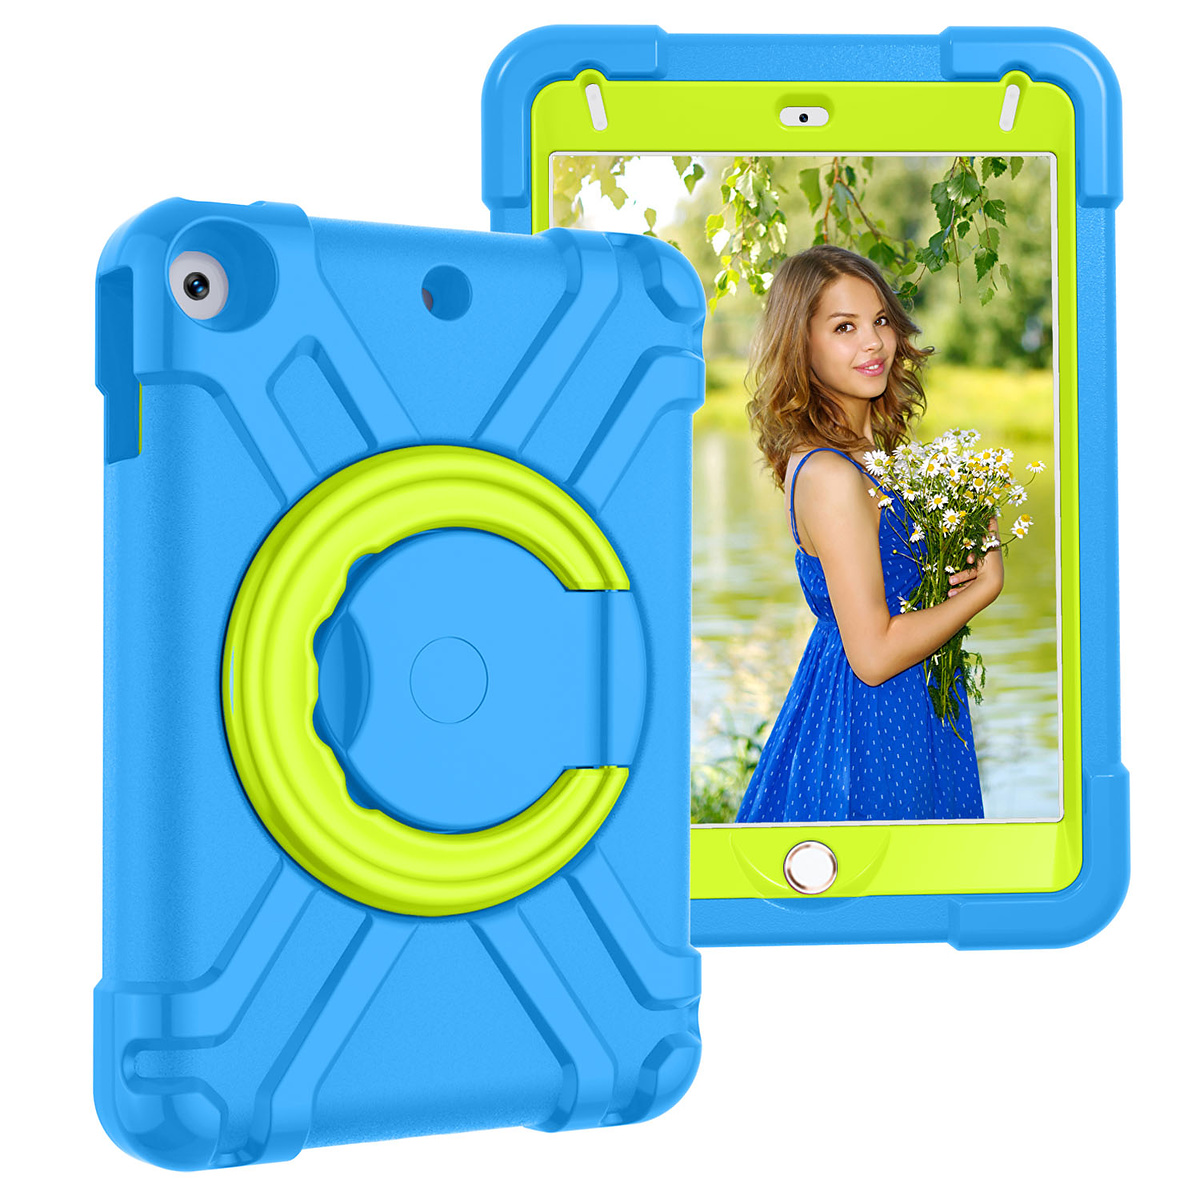 Barnfodral med roterbart ställ, iPad mini 4/5, blå/grön